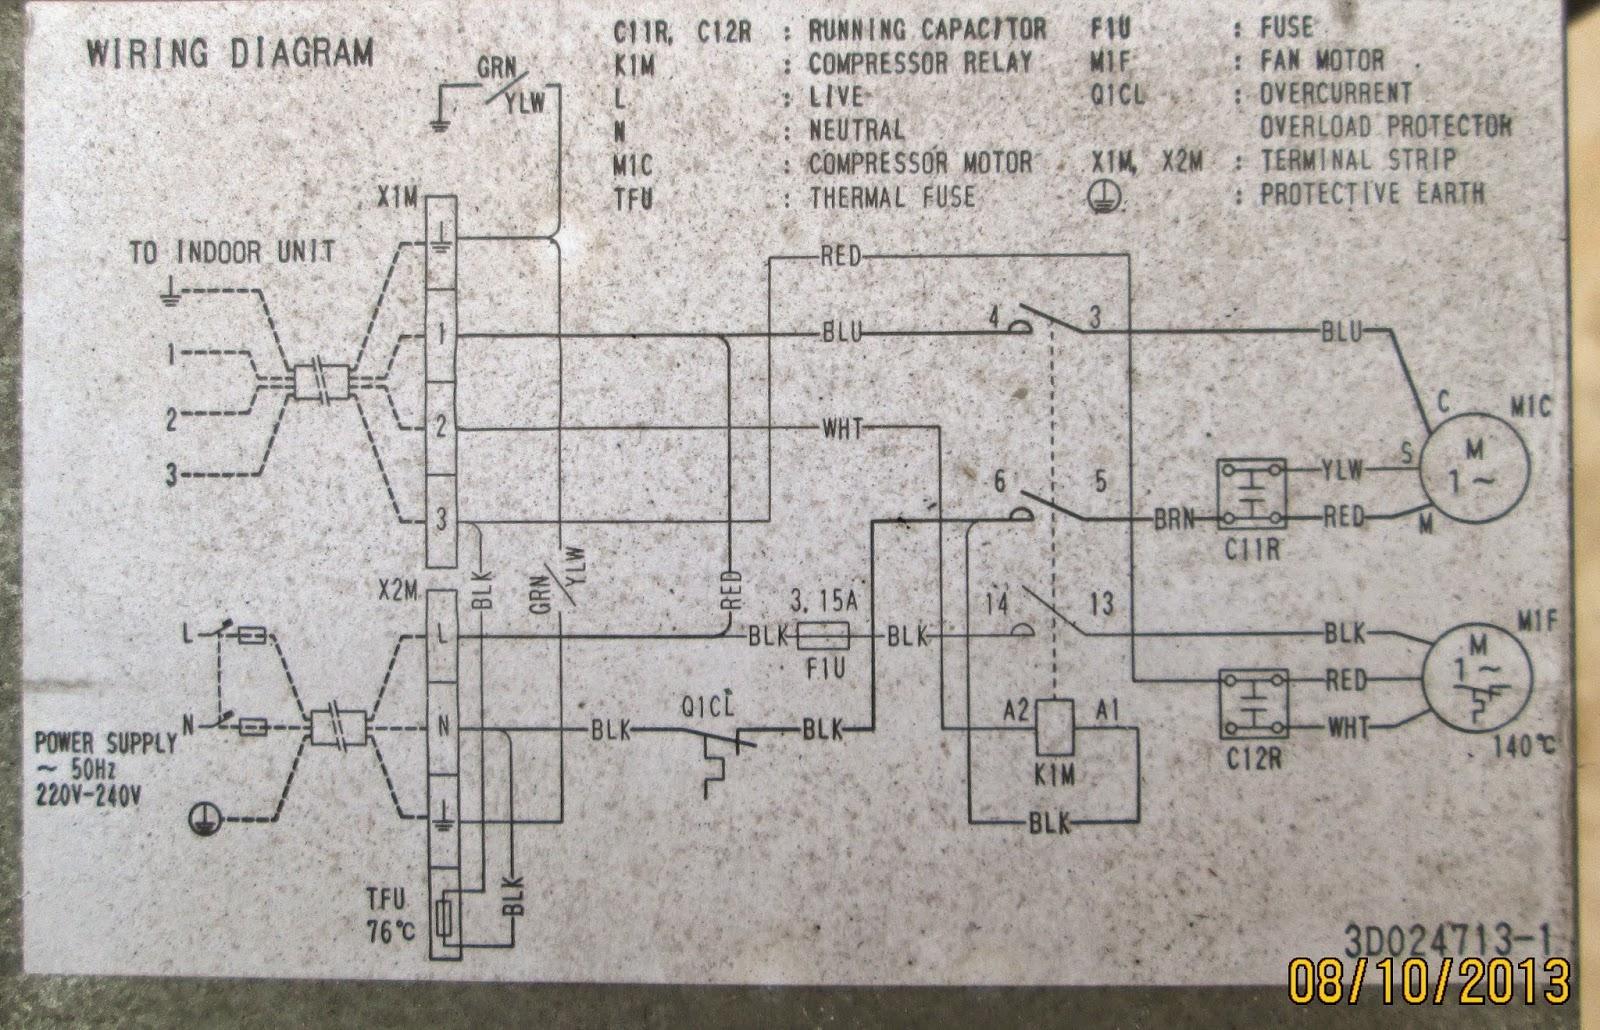 Service AC Kota Serang Baru: Diagram Kelistrikan AC split